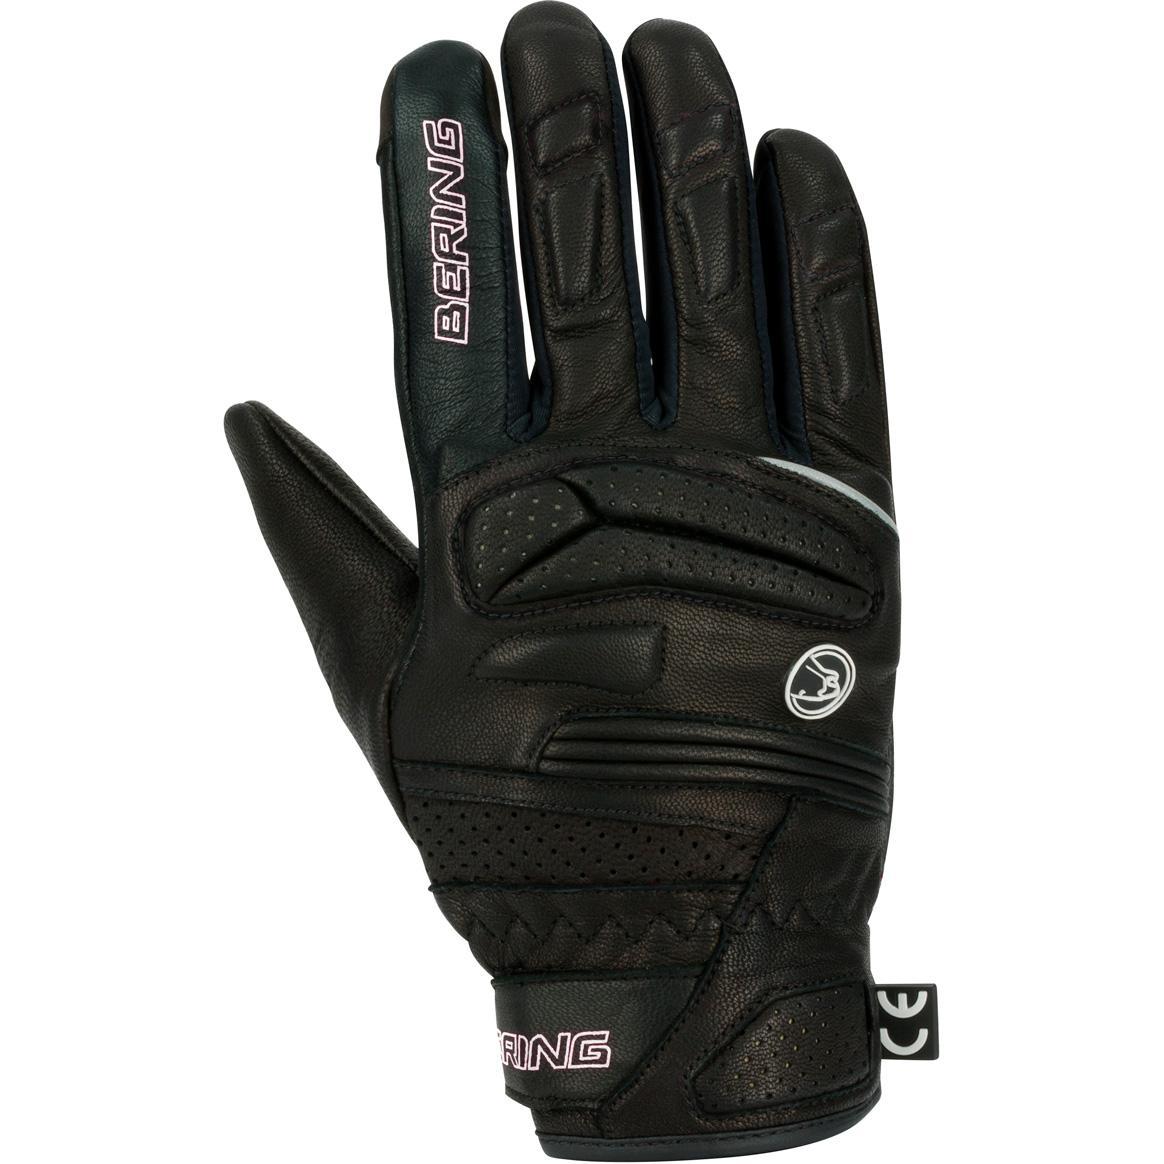 BERING-gants-lady-java-image-10685733